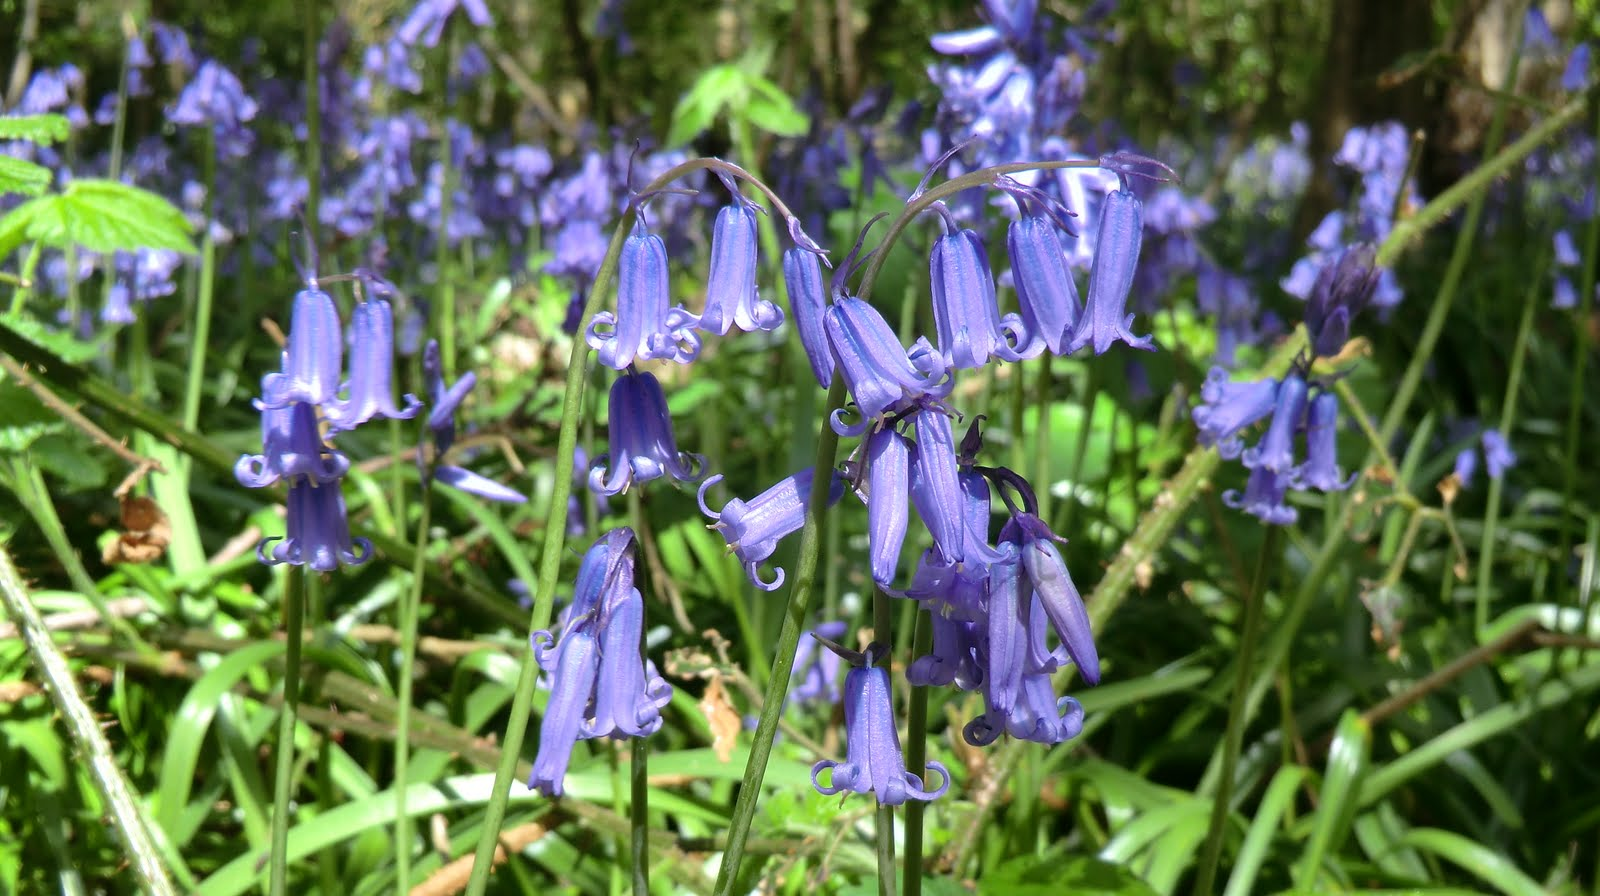 CIMG6409 Bluebells, Kings Wood